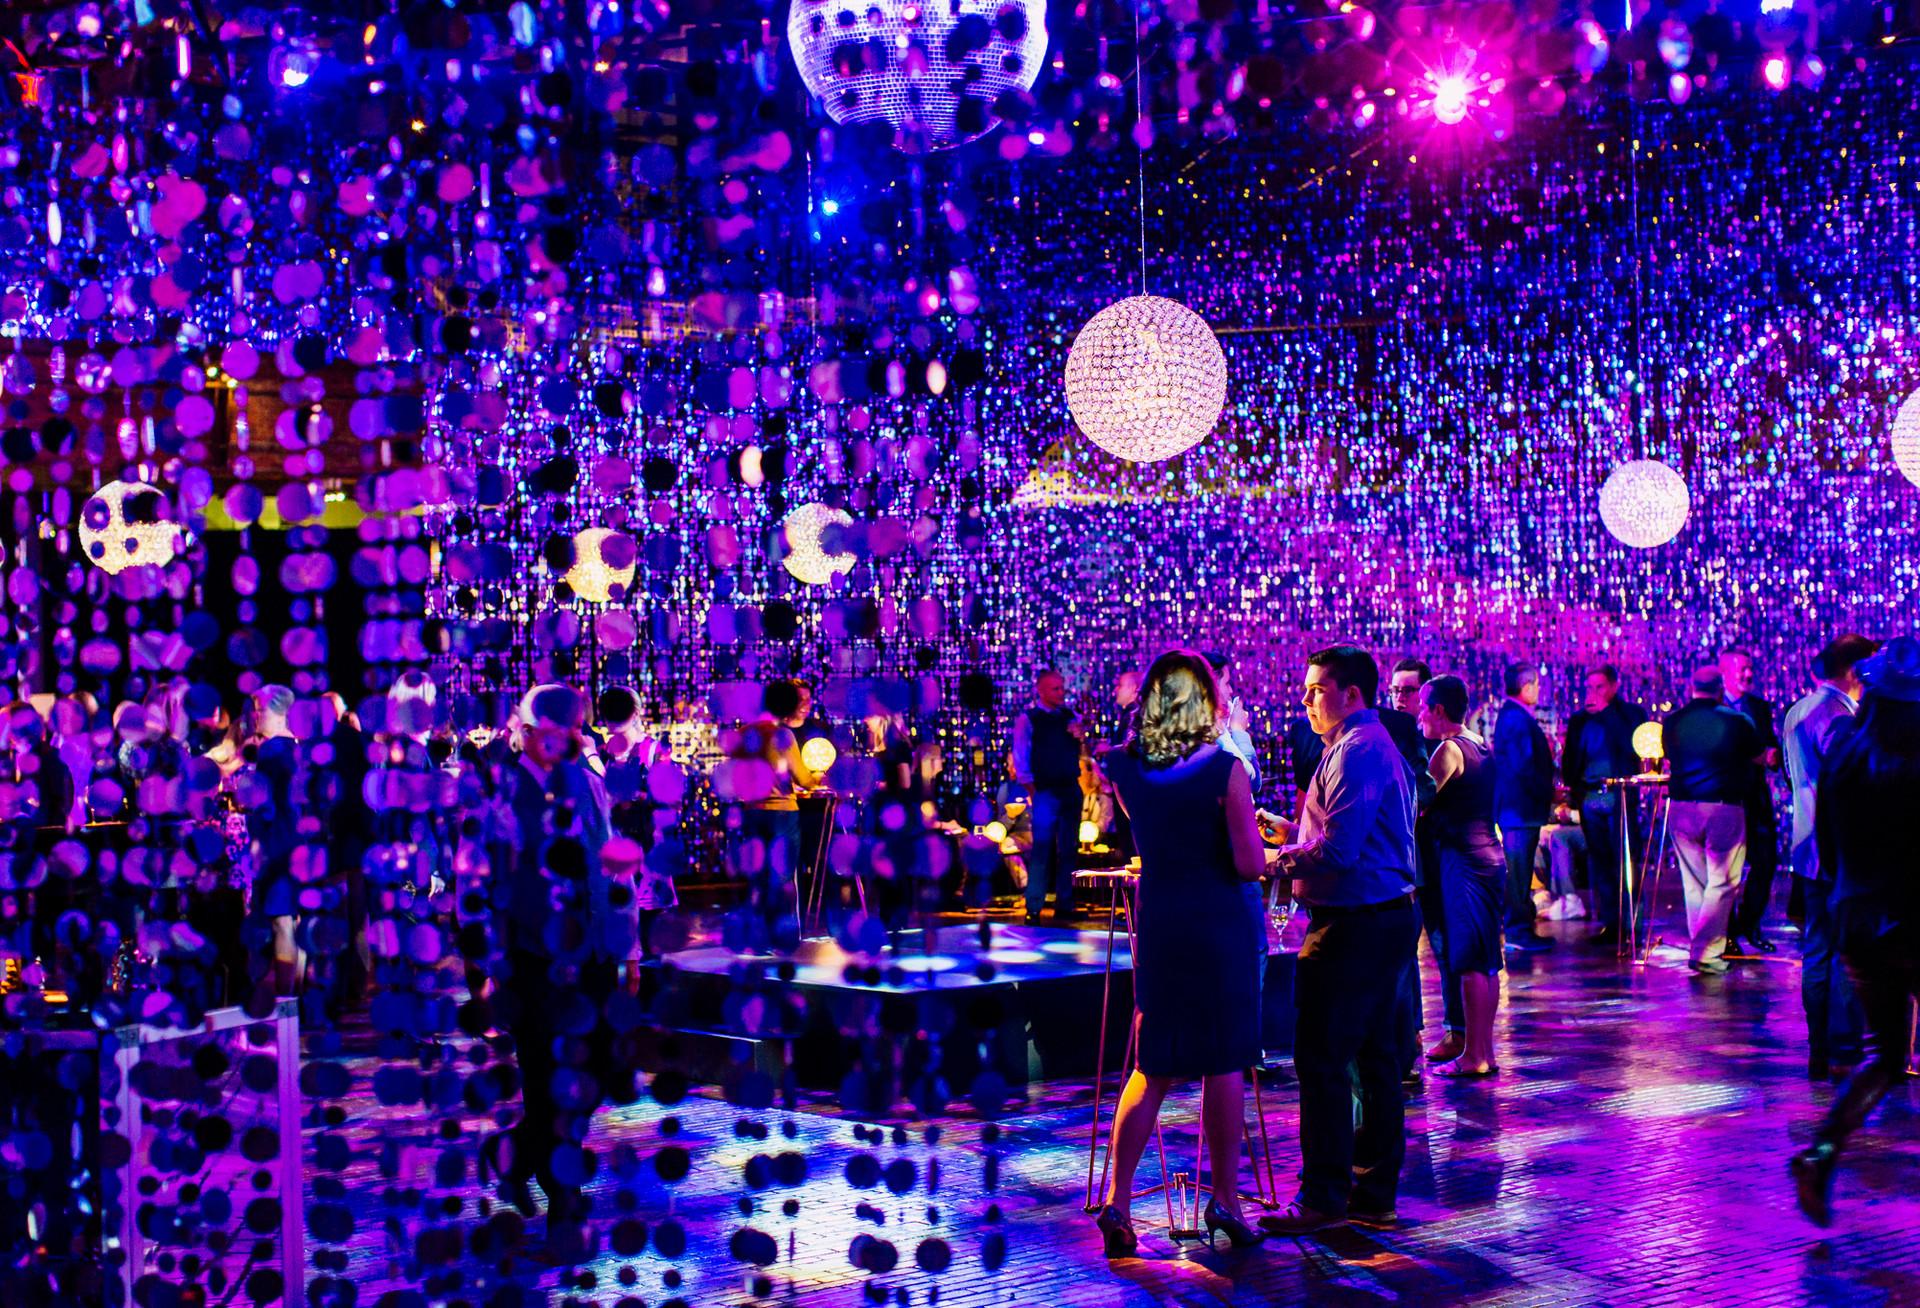 The Boston Purple Party